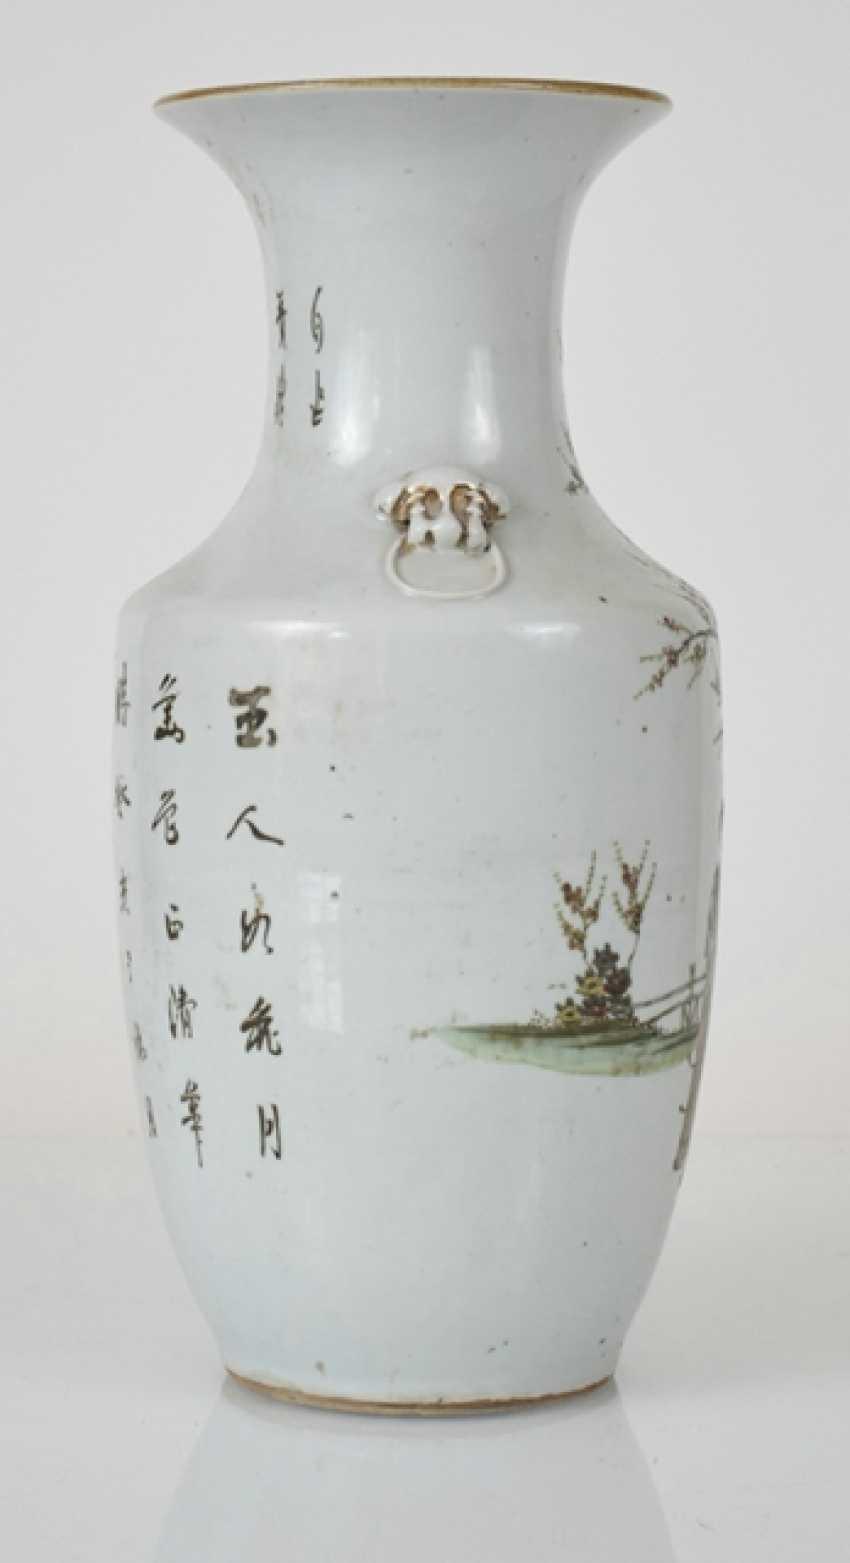 Porcelain vase with decoration of ladies in garden - photo 3